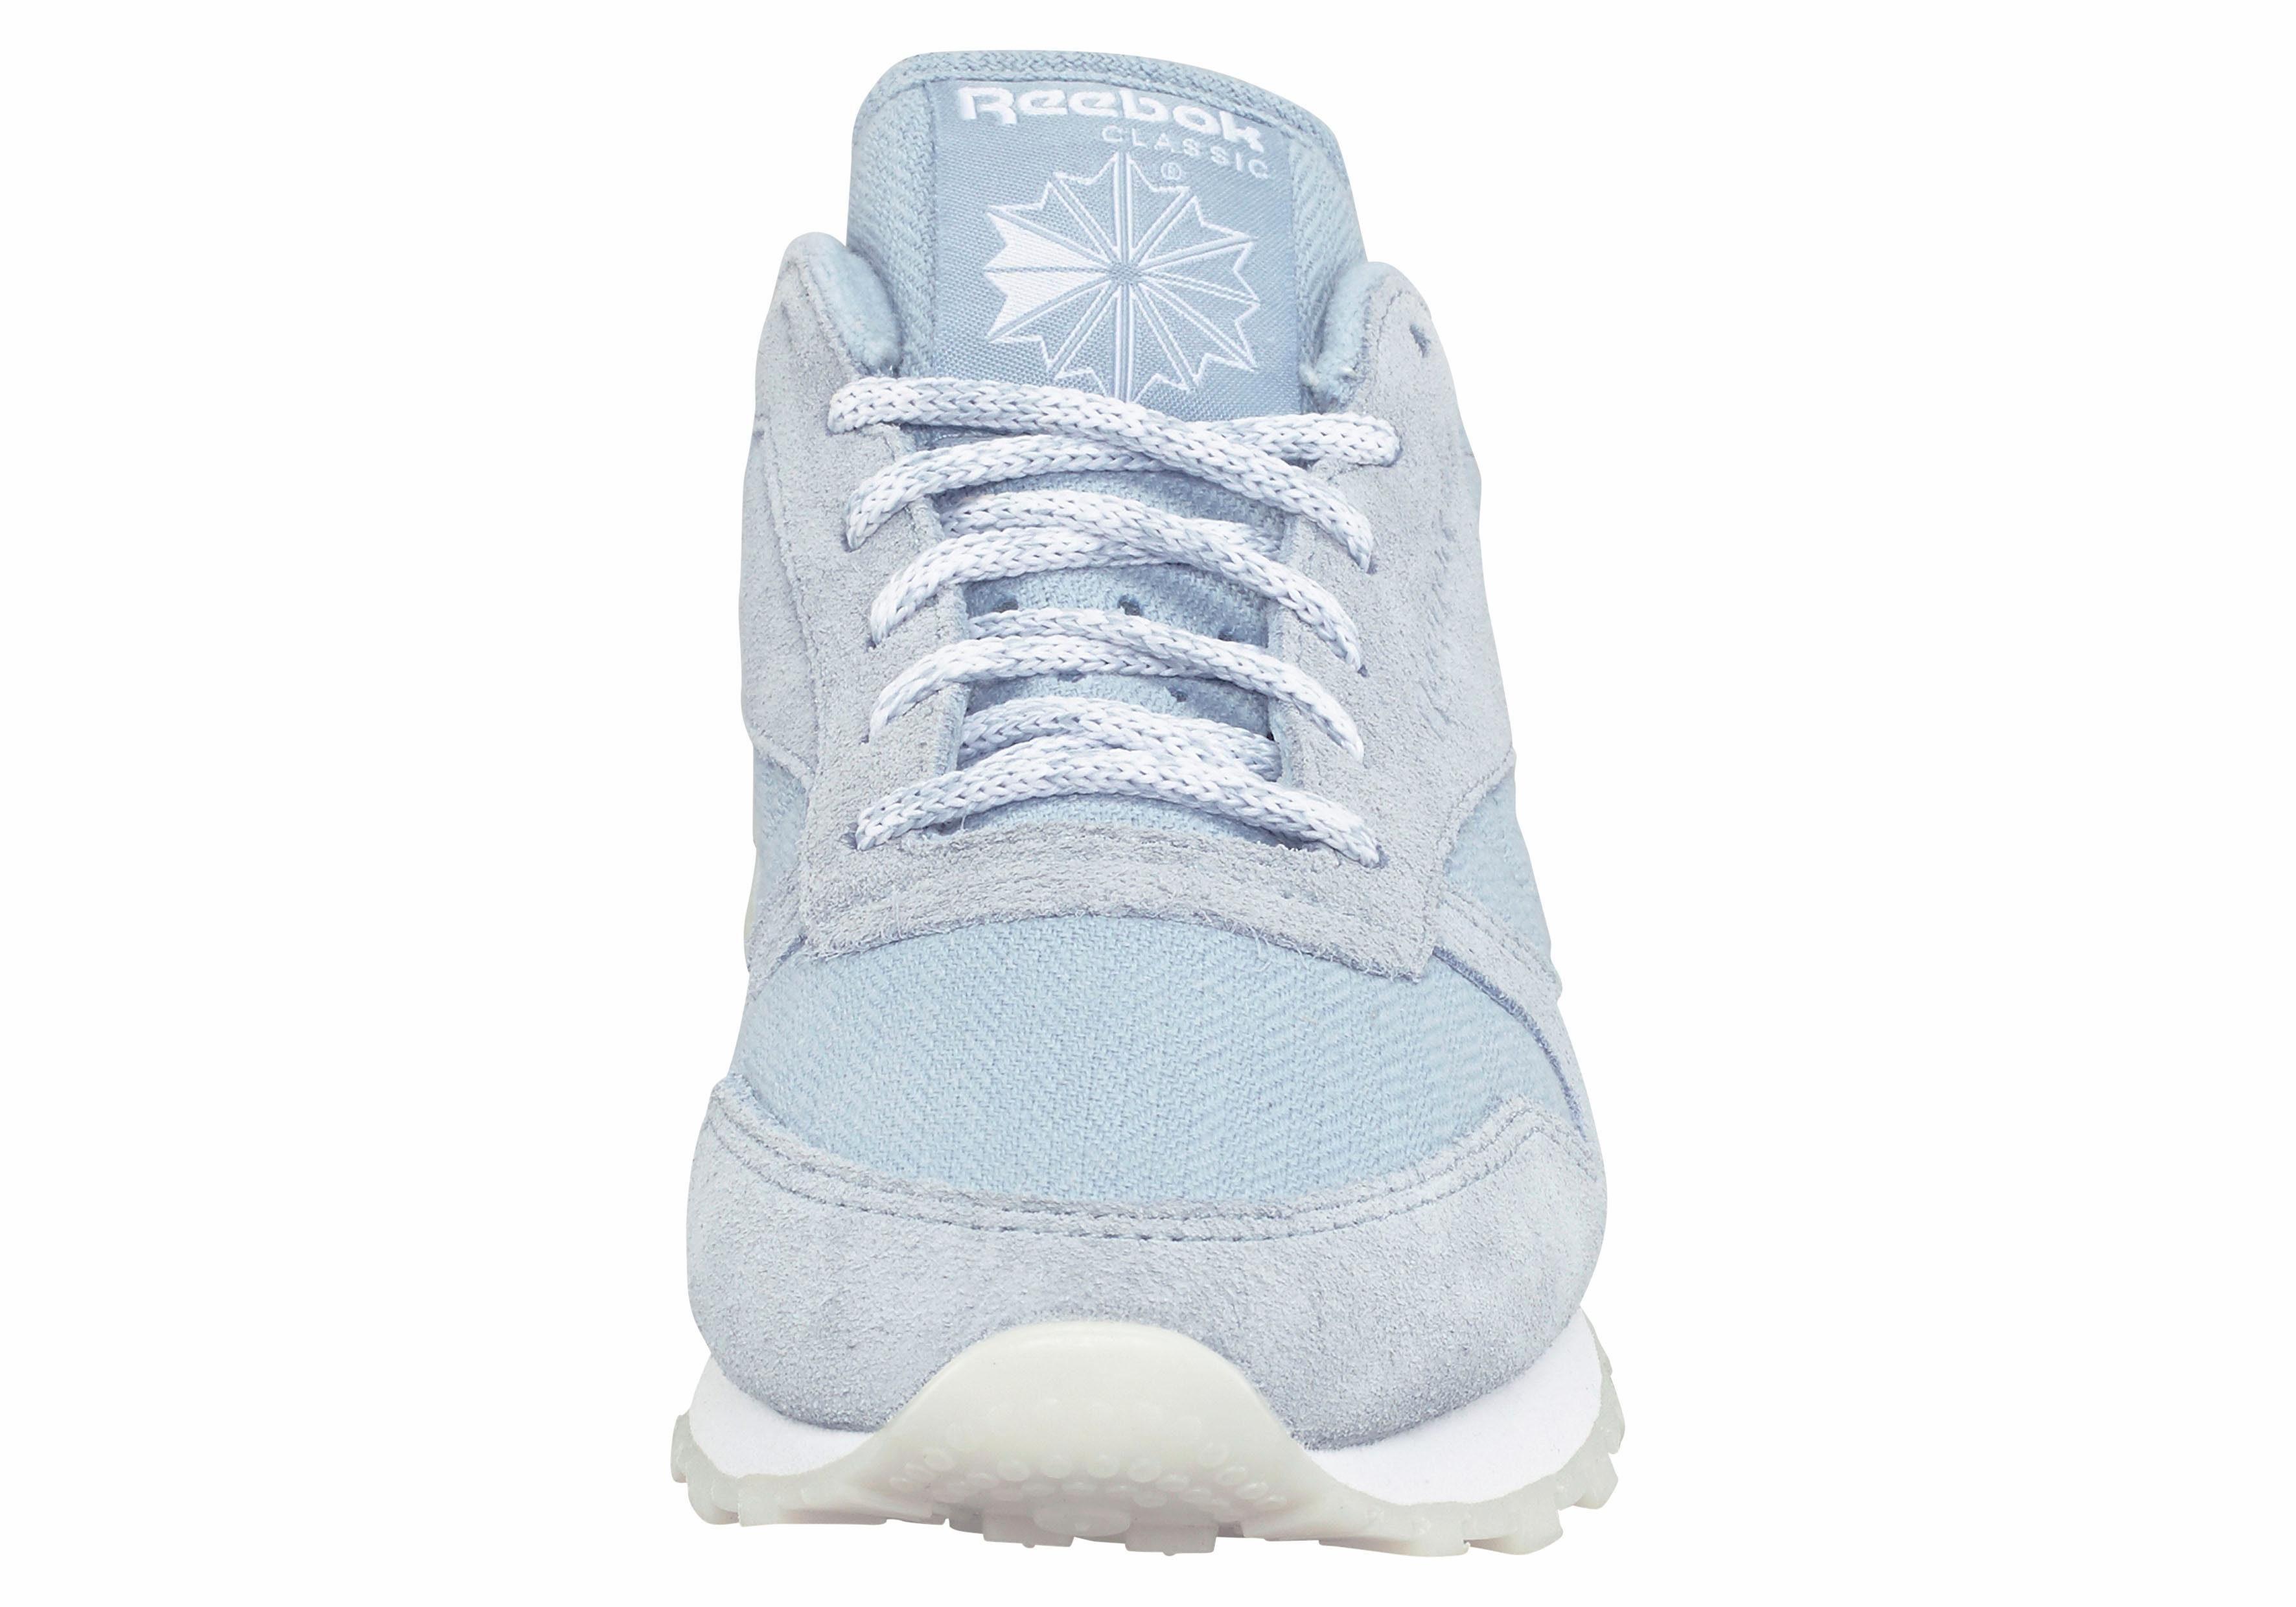 Reebok Classic Classic Leather Sea-Worn Sneaker  hellblau